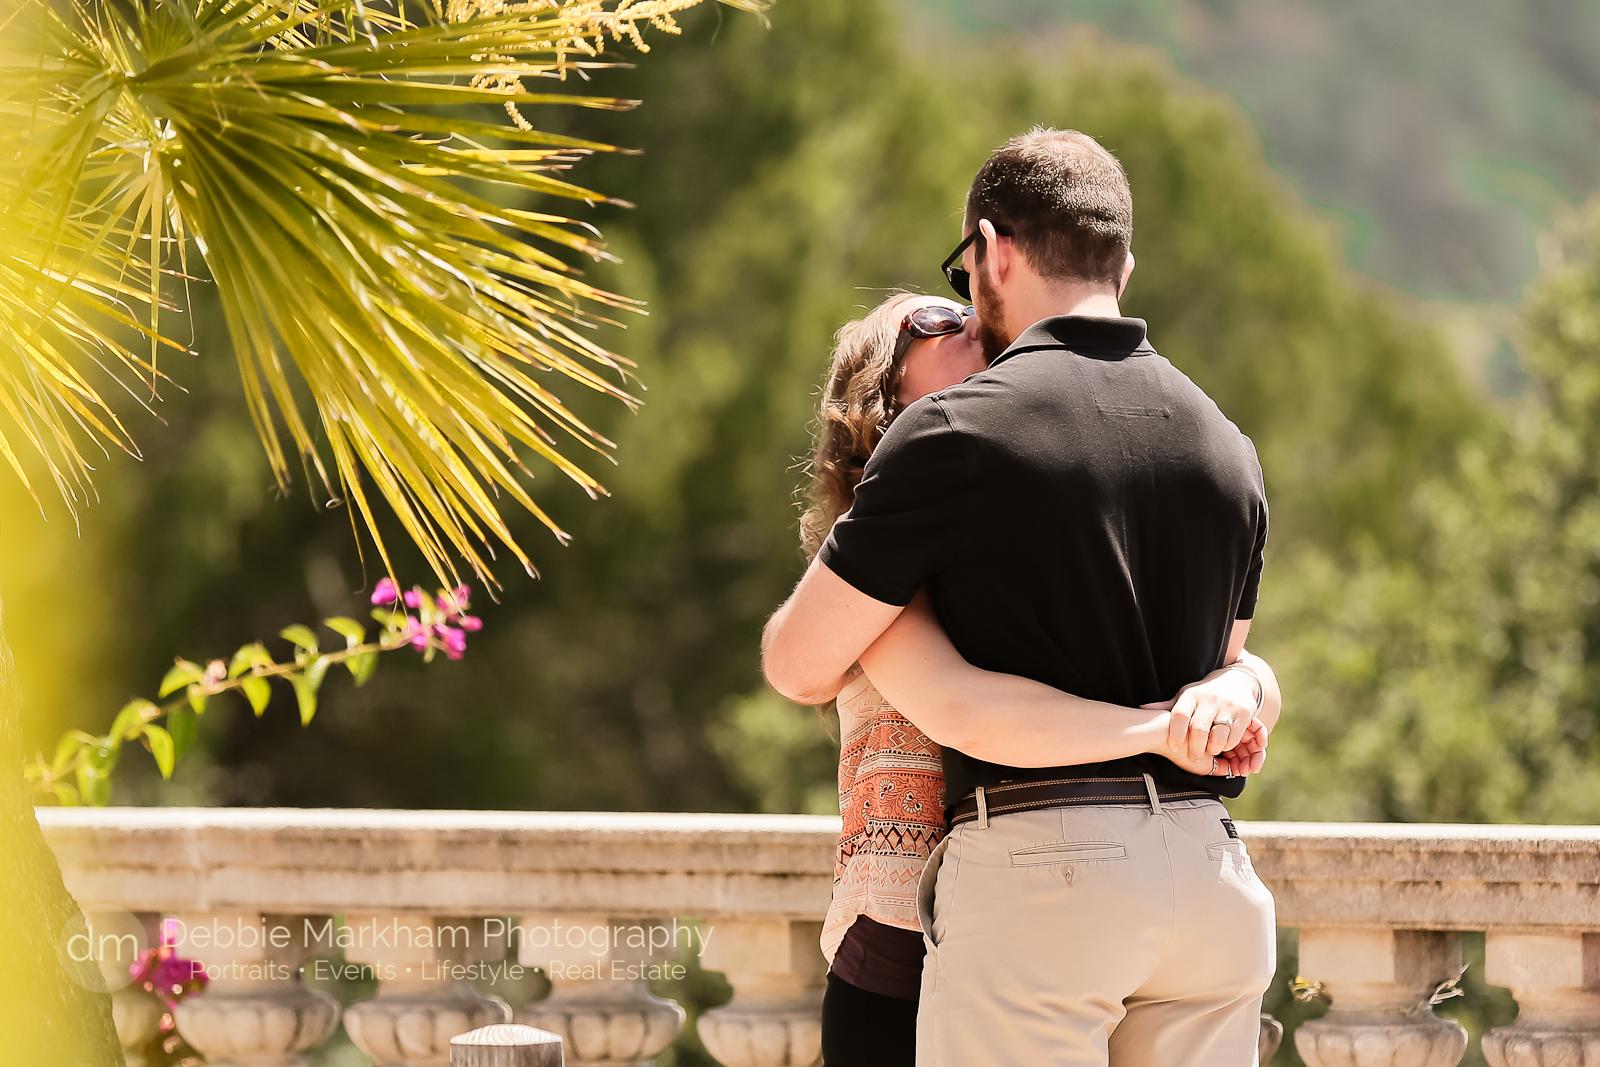 4-29-15 Surprise Proposal at Hearst Castle-5234